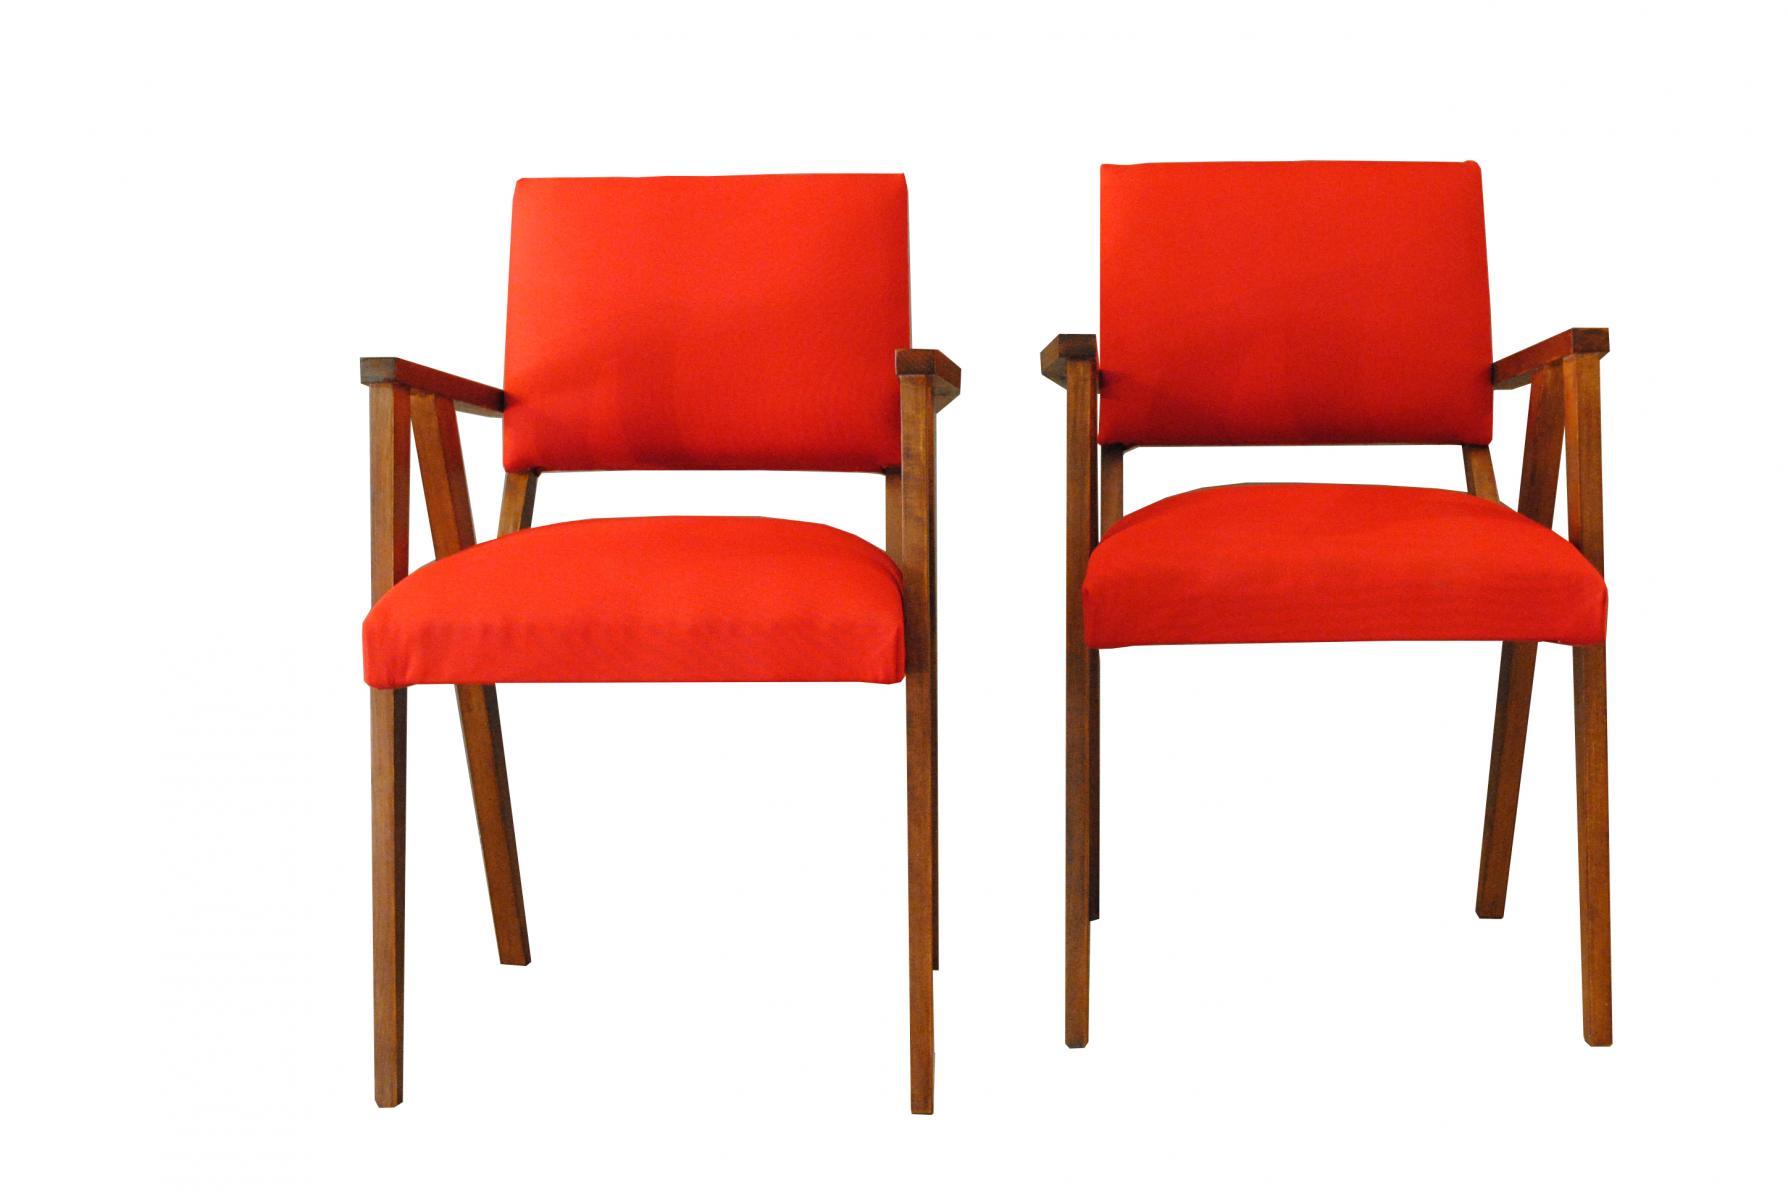 Small armchairs small mid-century rosewood armchairs, set of 2 YBTDJHE